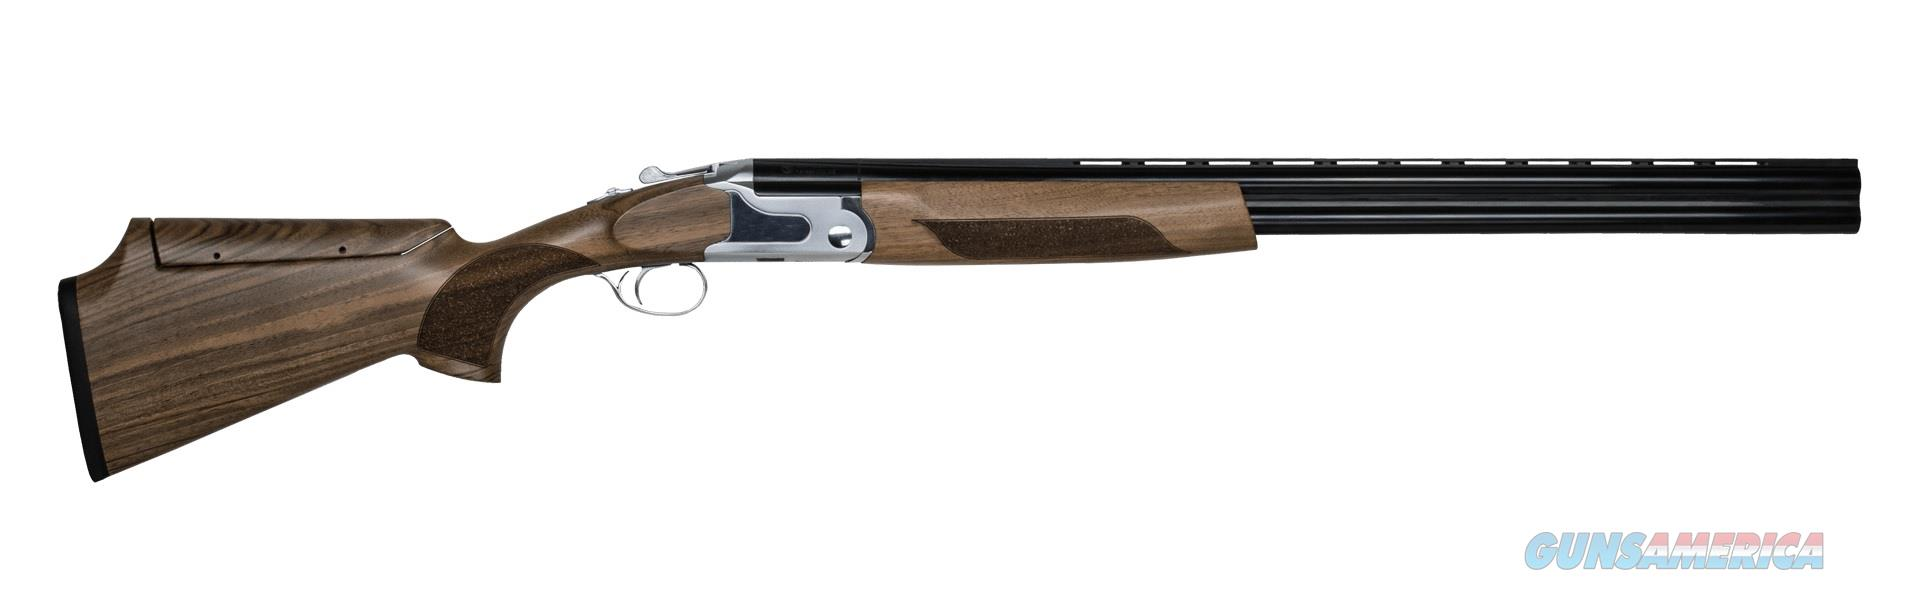 "CZ-USA CZ SCTP Southpaw Sterling 12 Gauge Walnut 28"" 06490   Guns > Shotguns > CZ Shotguns"